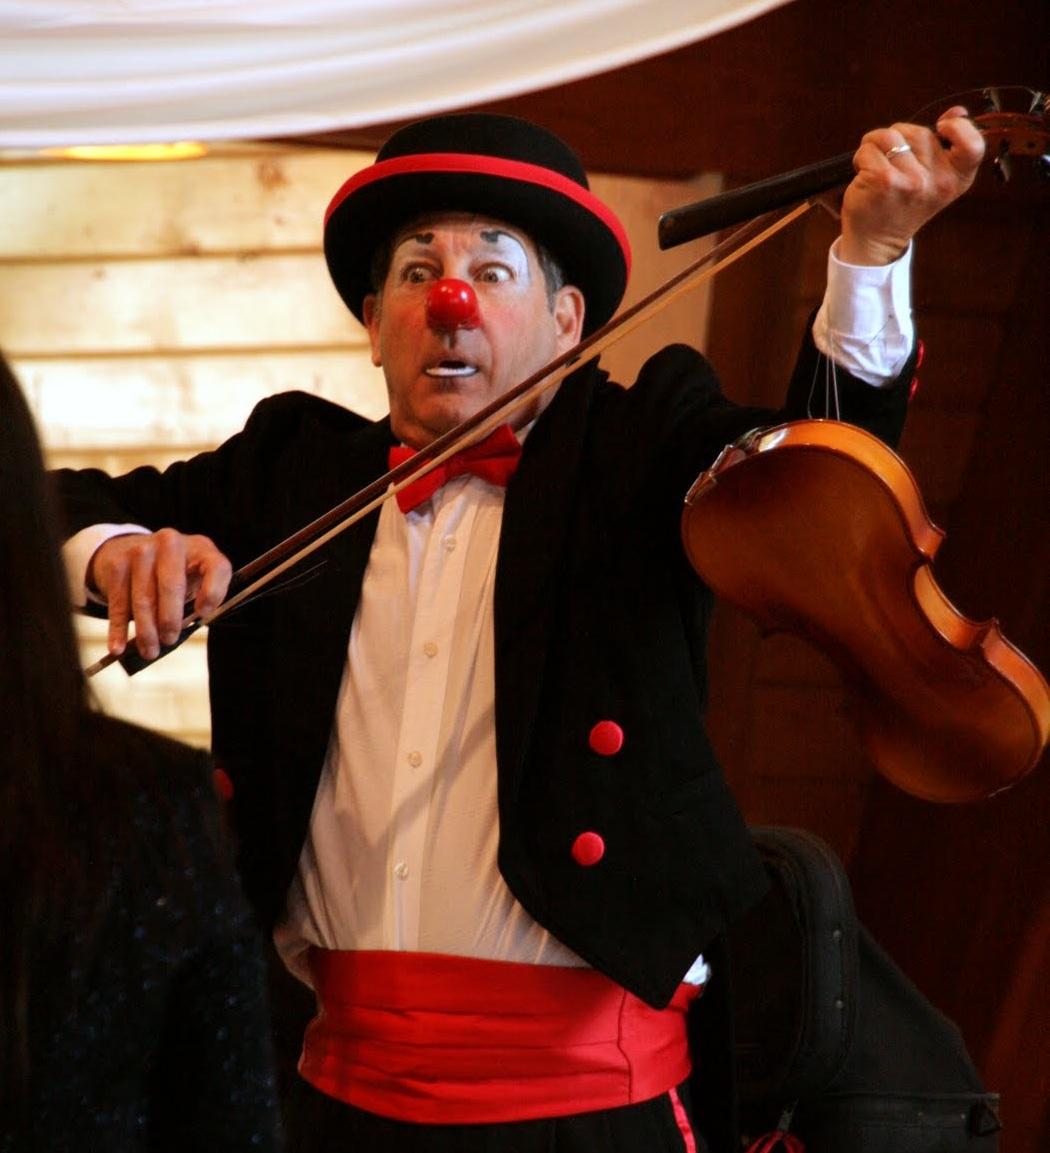 Musical Clown Atlanta GA